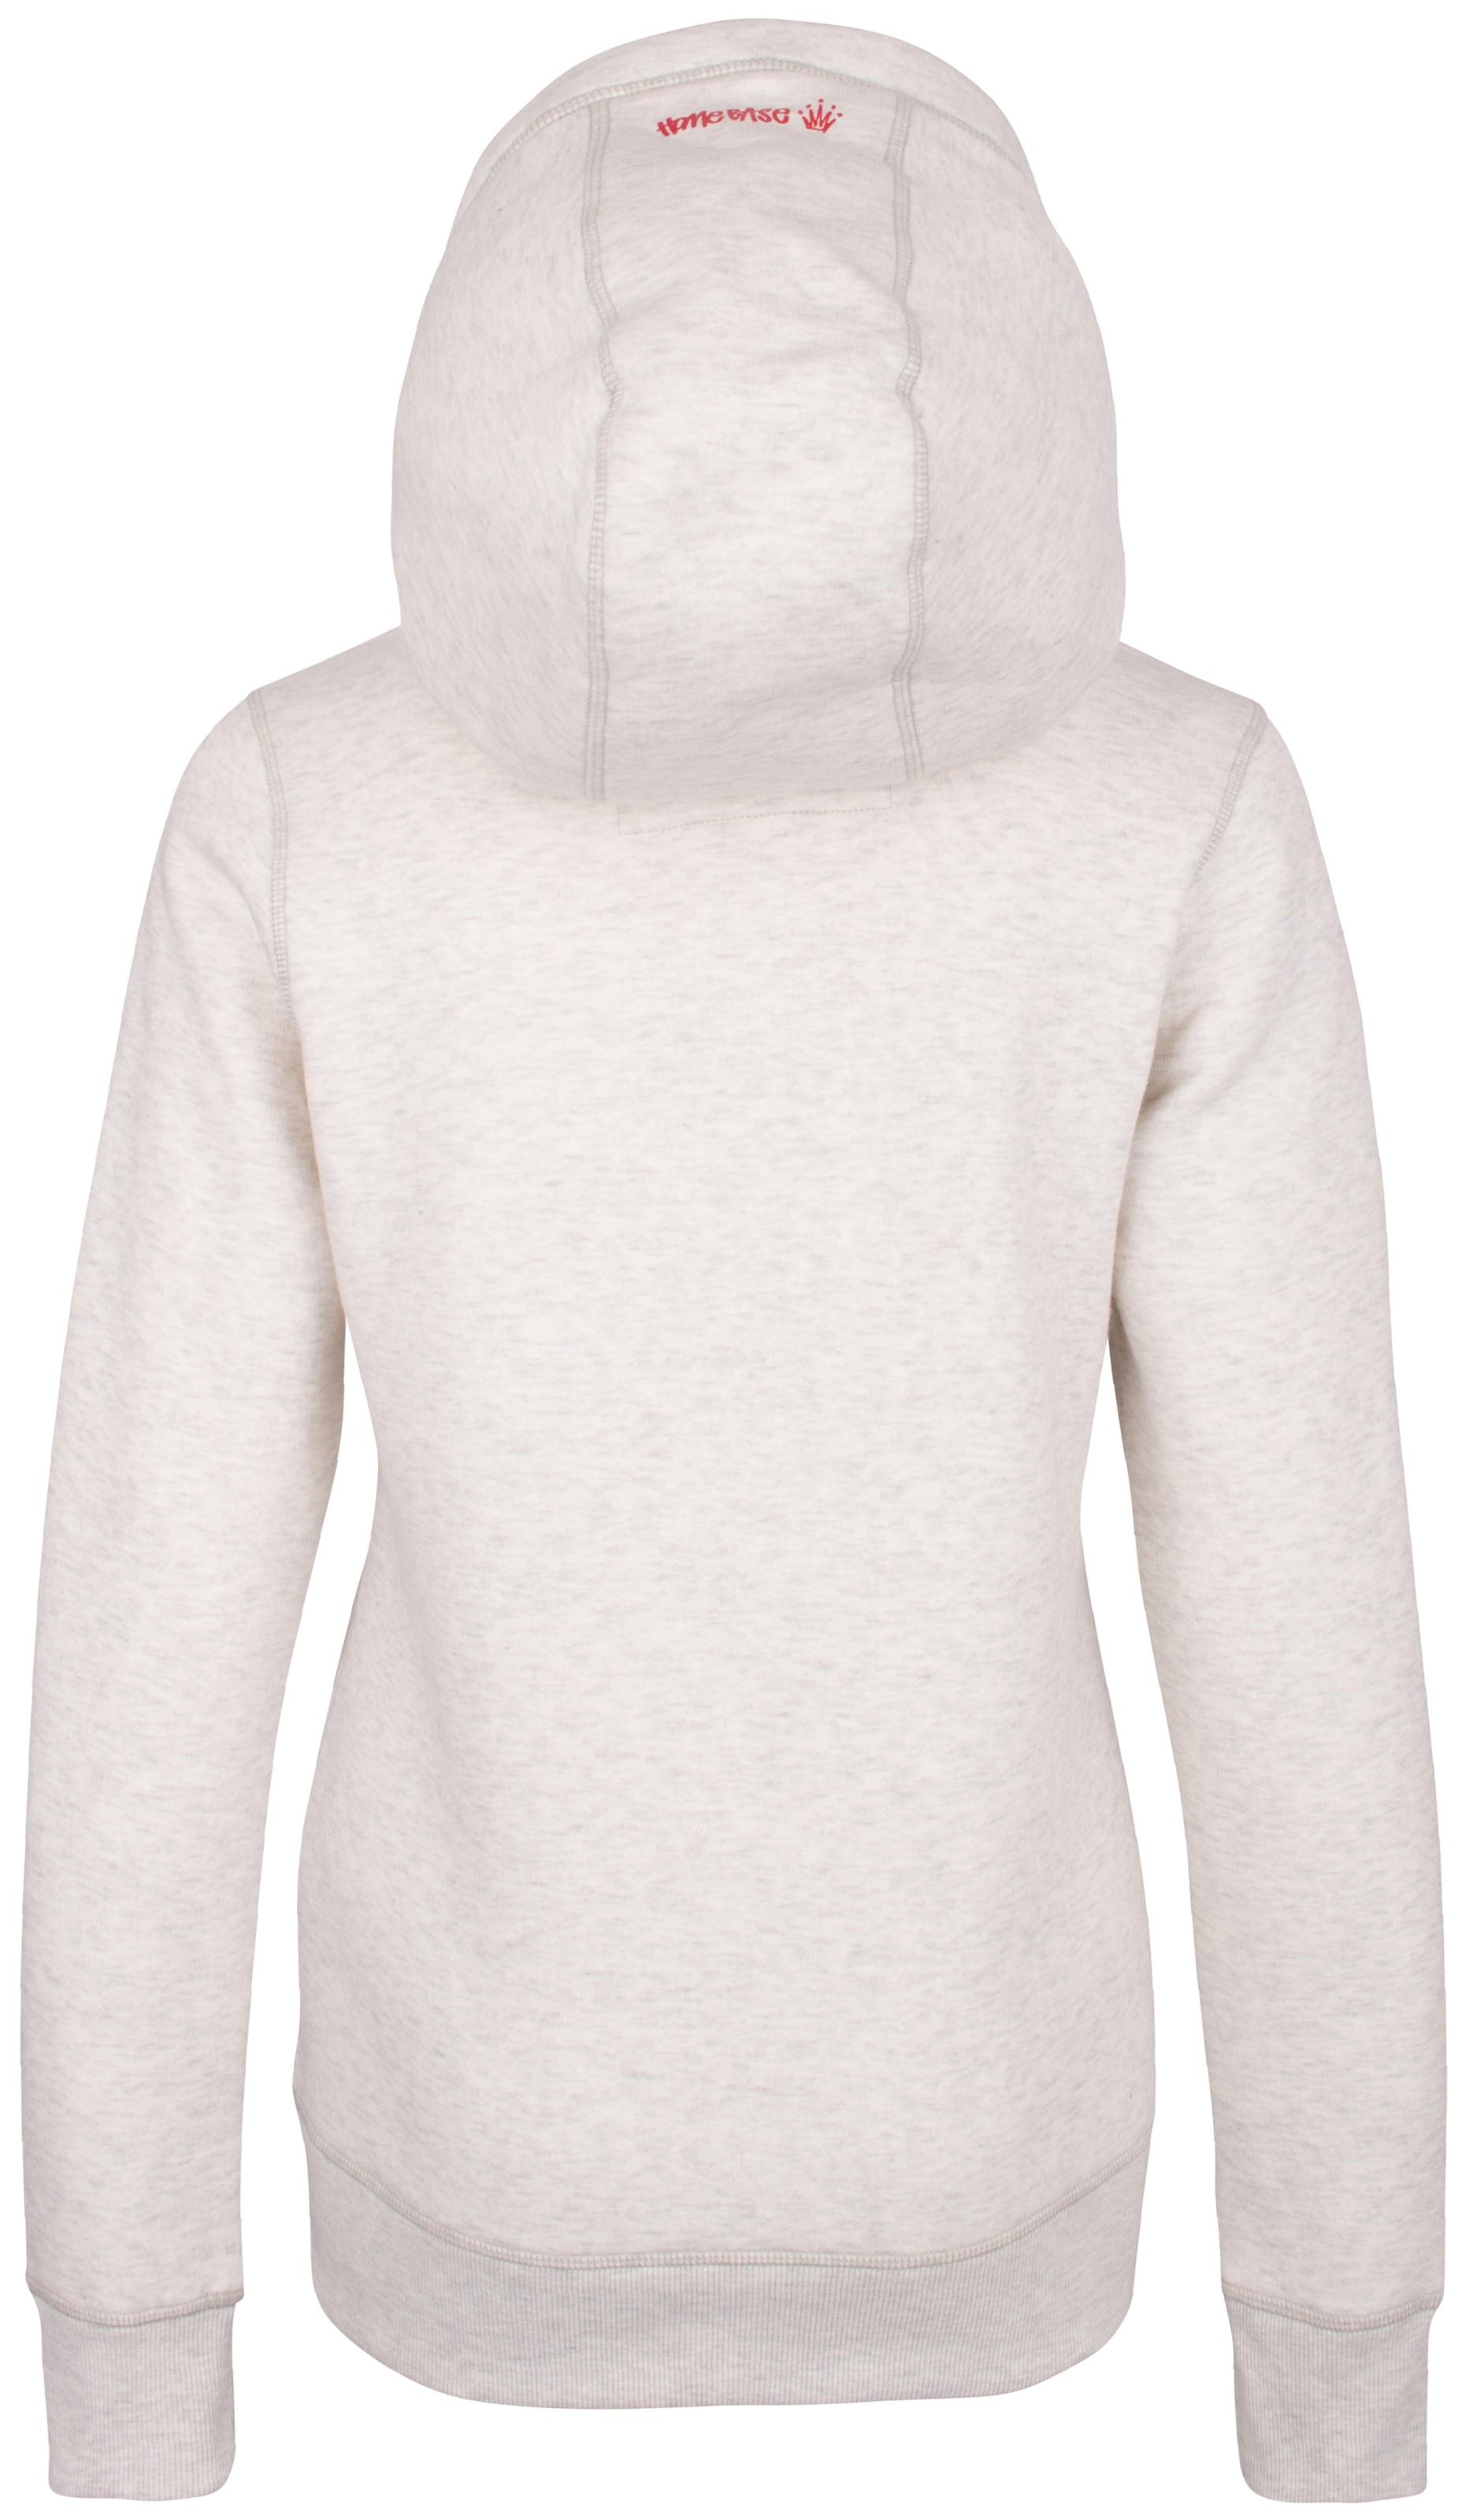 RougeNoir Homebase Blanc Sweat Cassé shirt En j354LAR